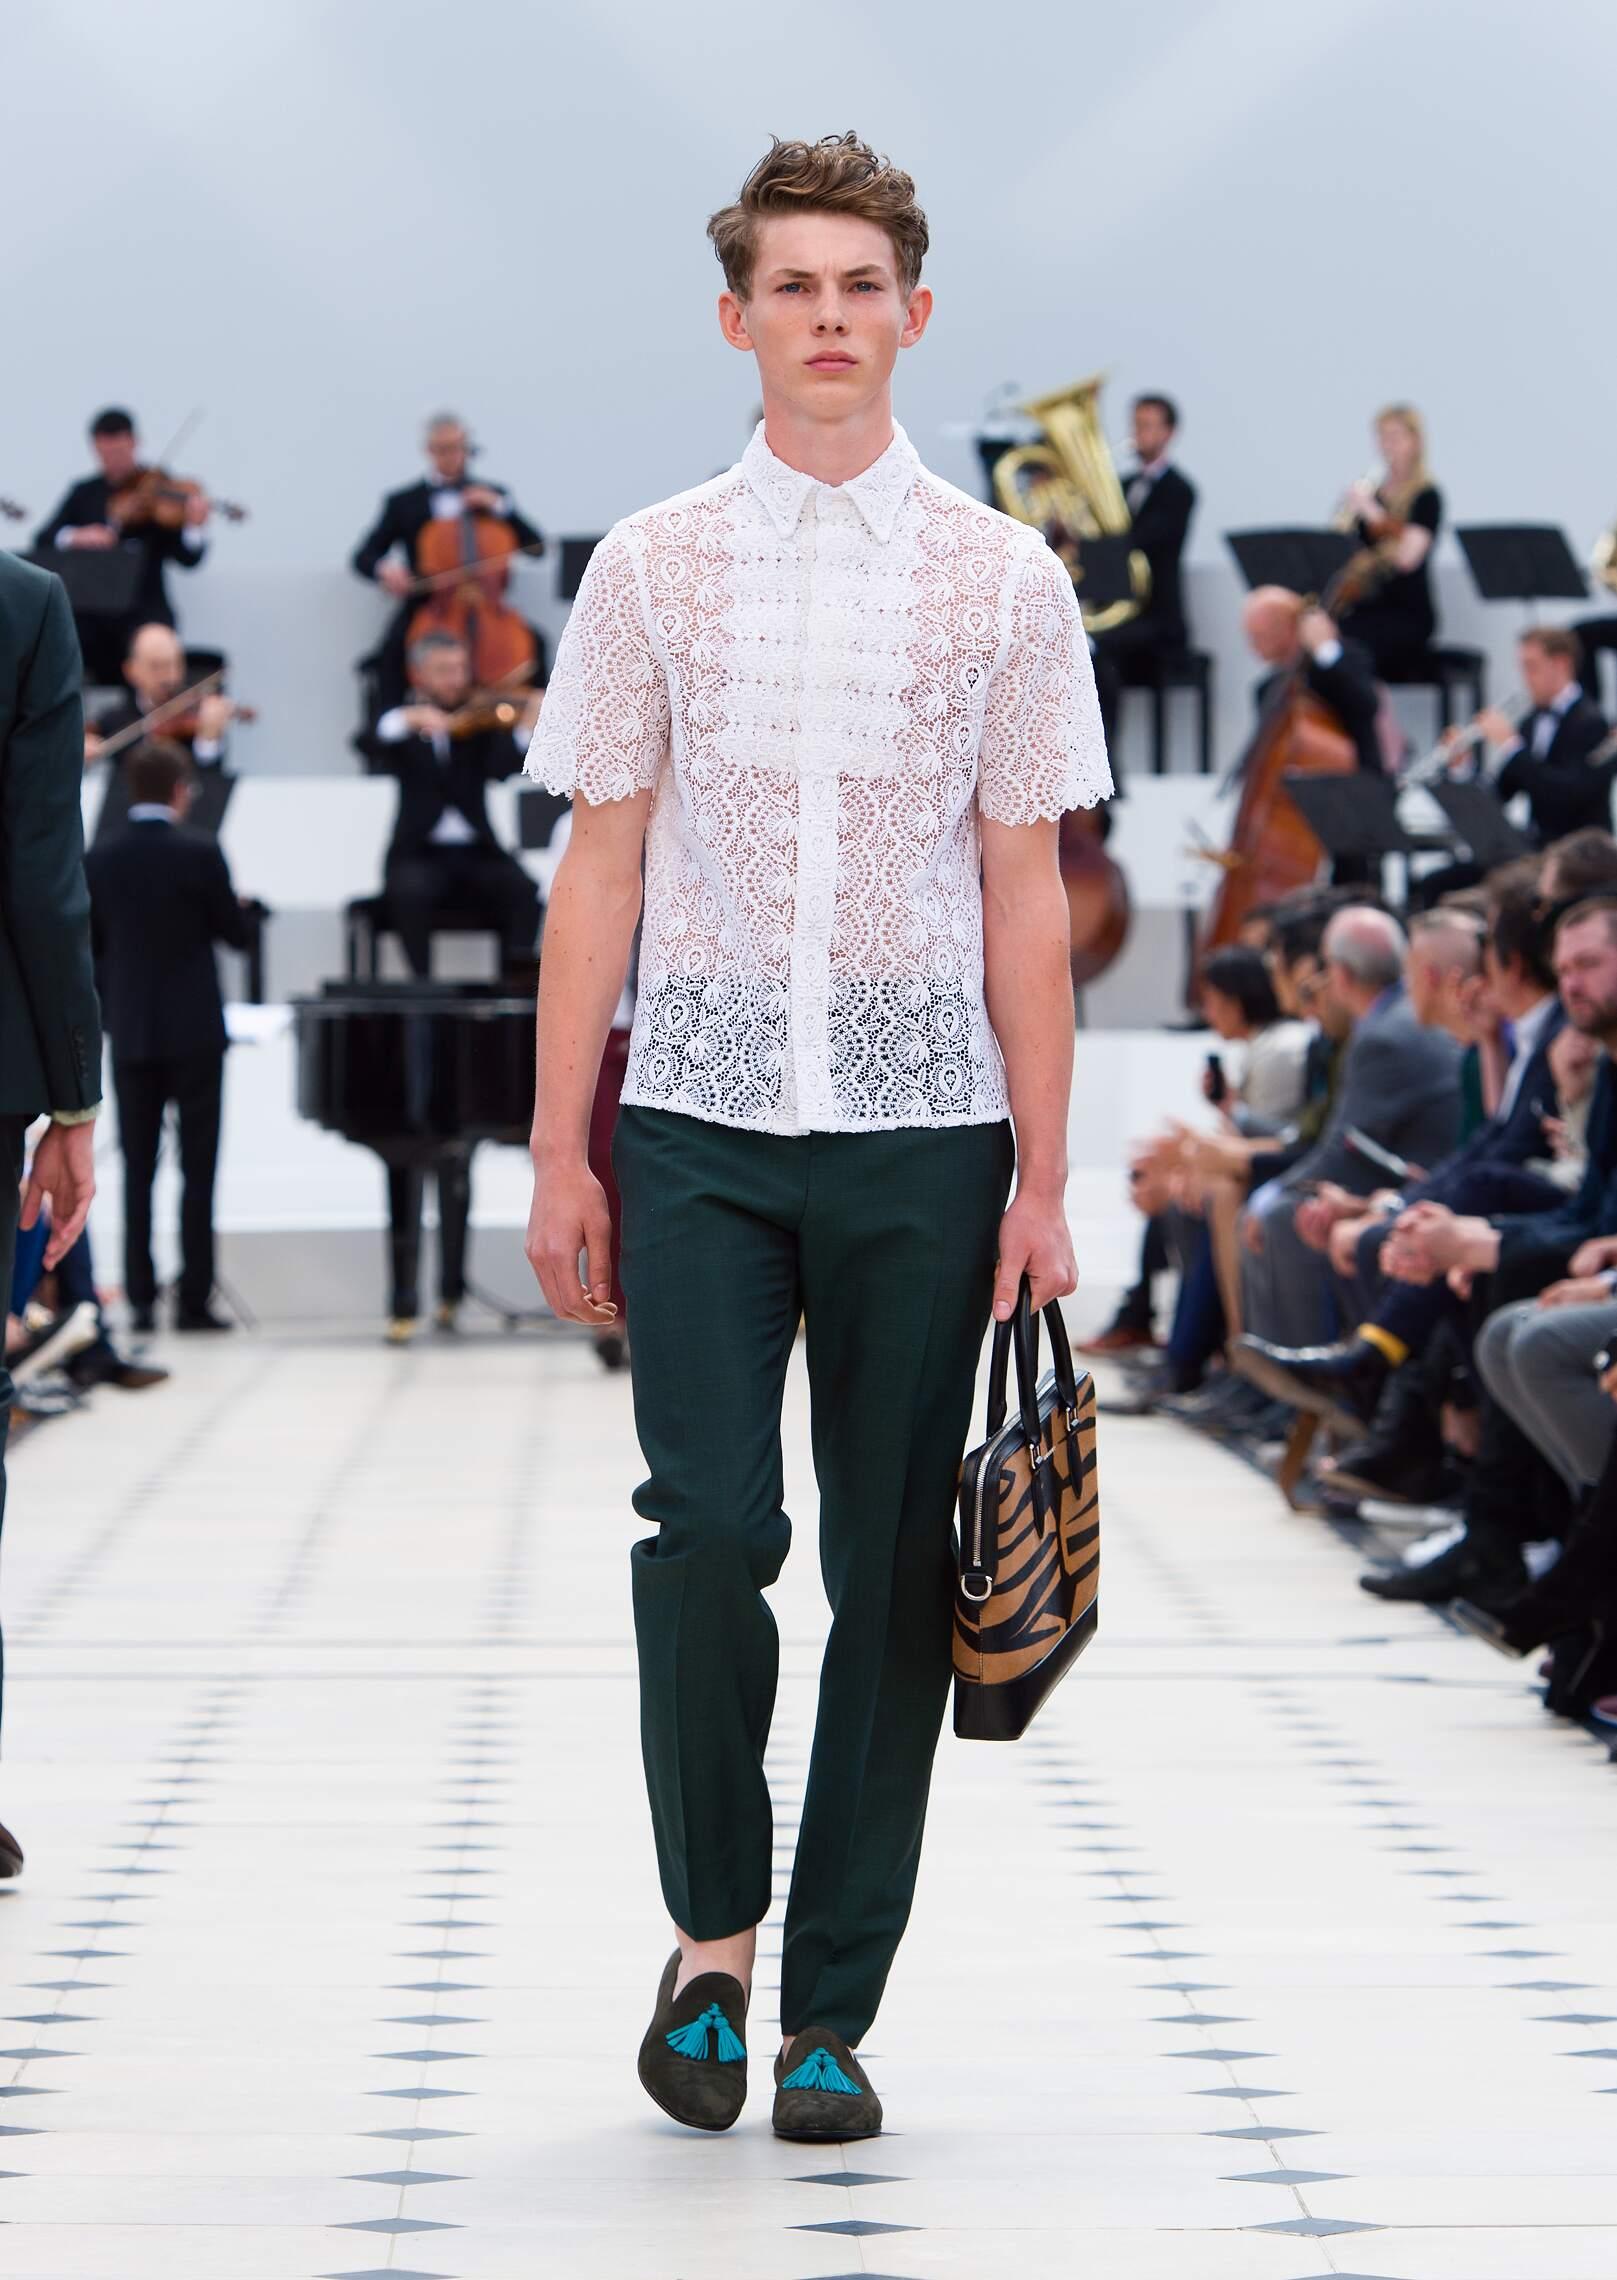 Burberry Prorsum Spring Summer 2016 Men's Collection London Fashion Week